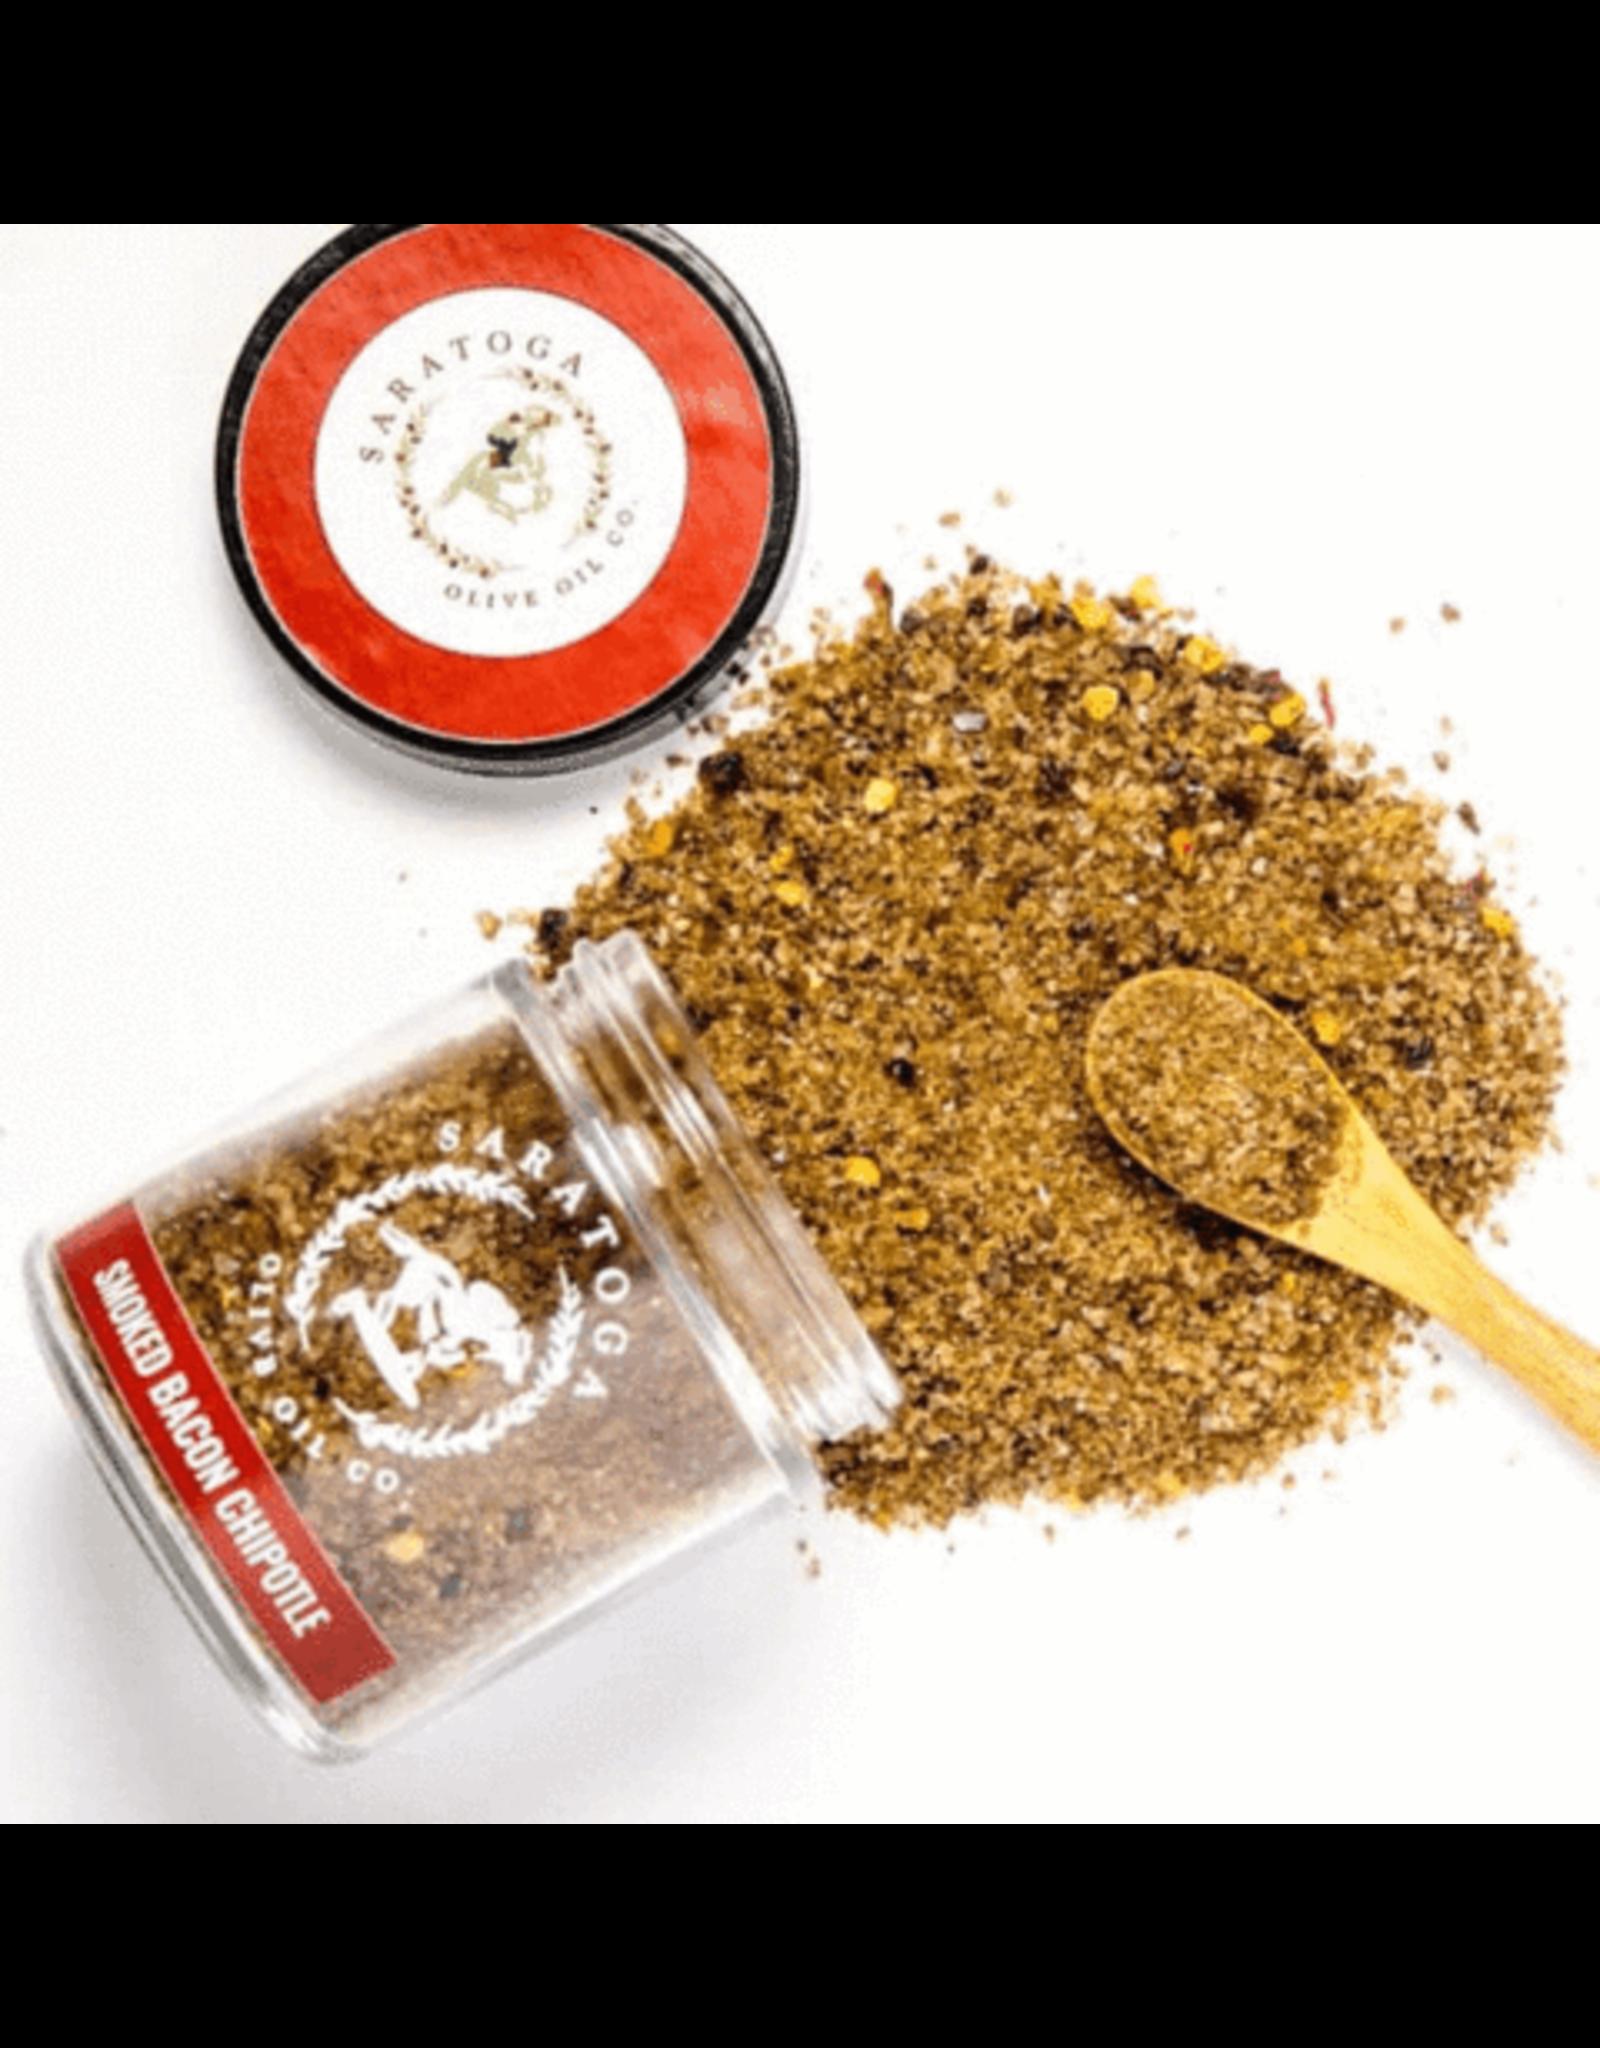 Saratoga Olive Oil Company Smoke Bacon Chipotle Salt